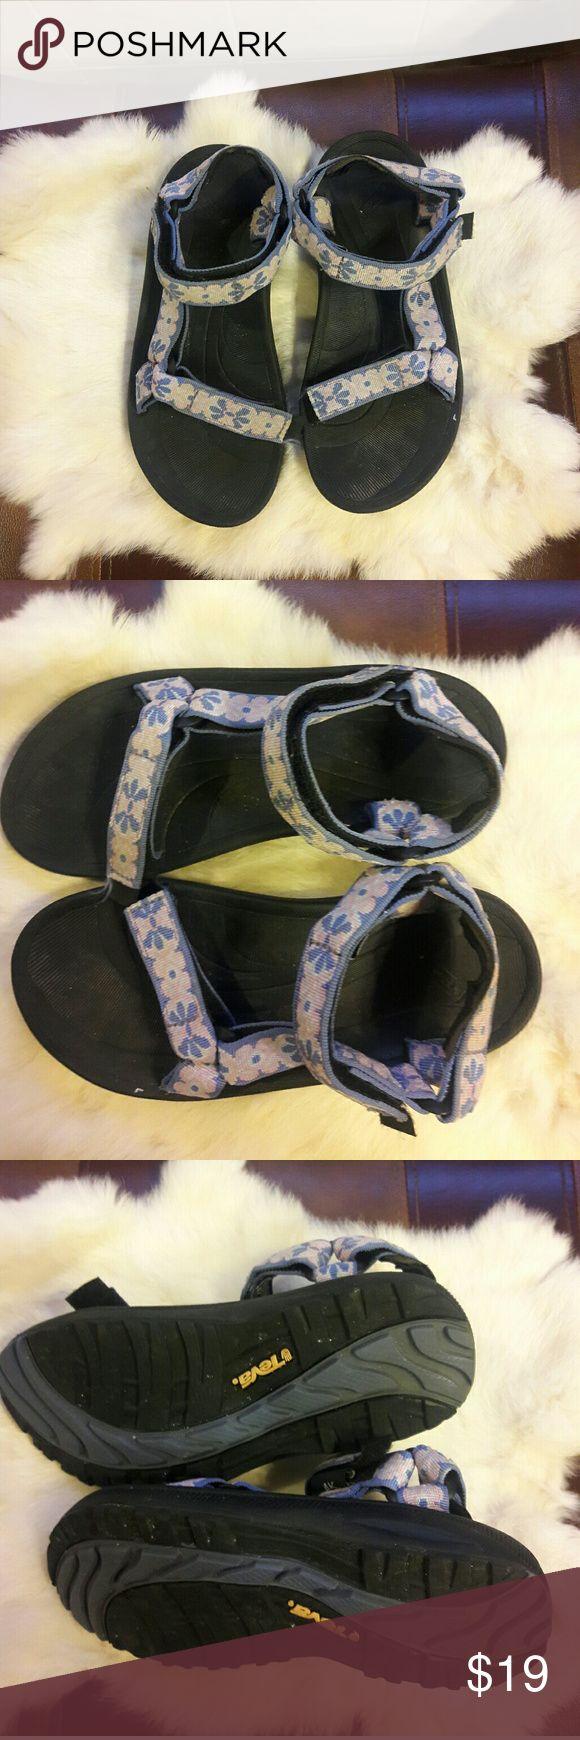 Classic girls Teva Sandle Sz. 4 Classic girls Teva Sandle Sz. 4 Teva Shoes Sandals & Flip Flops